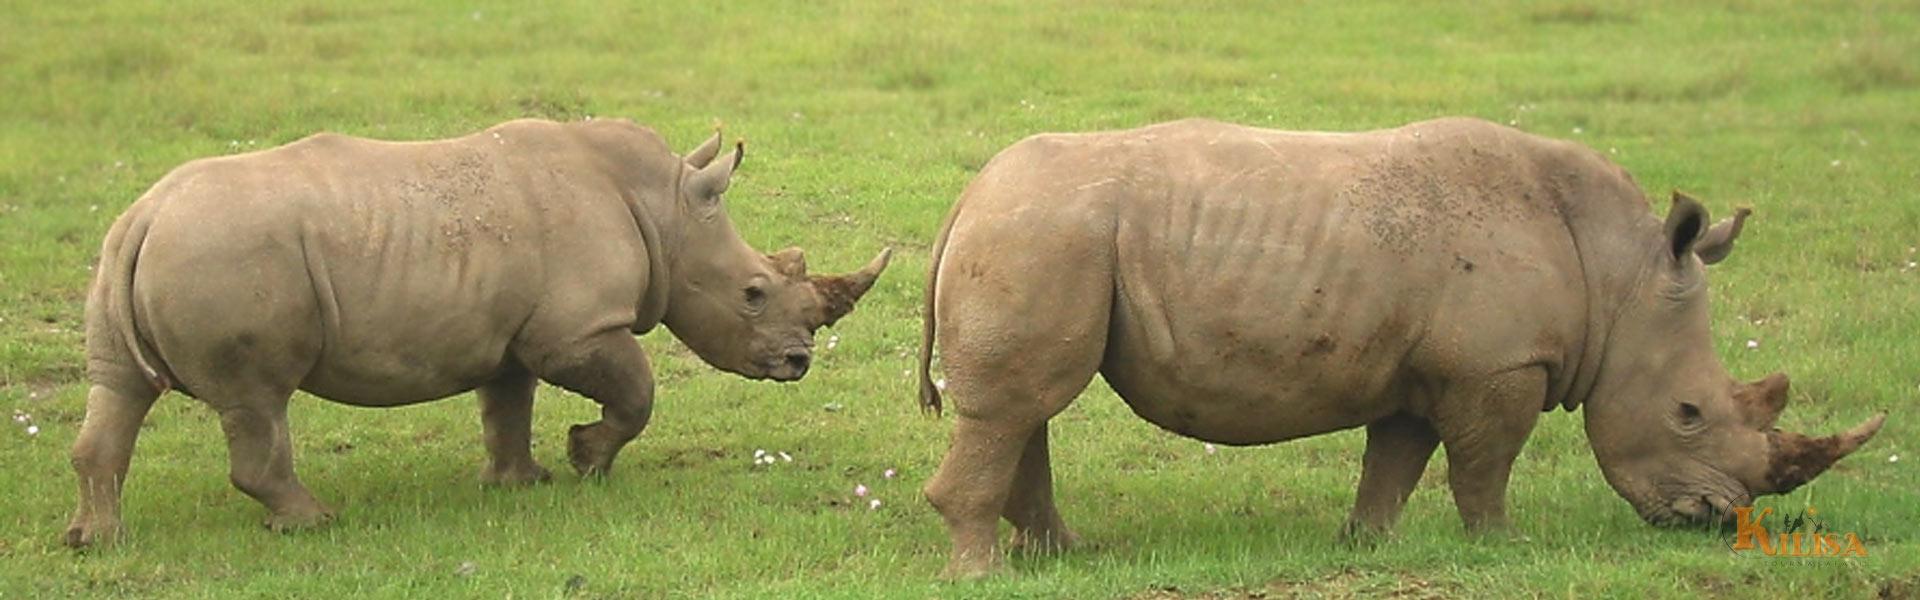 Ngorongoro Crater Day Tour